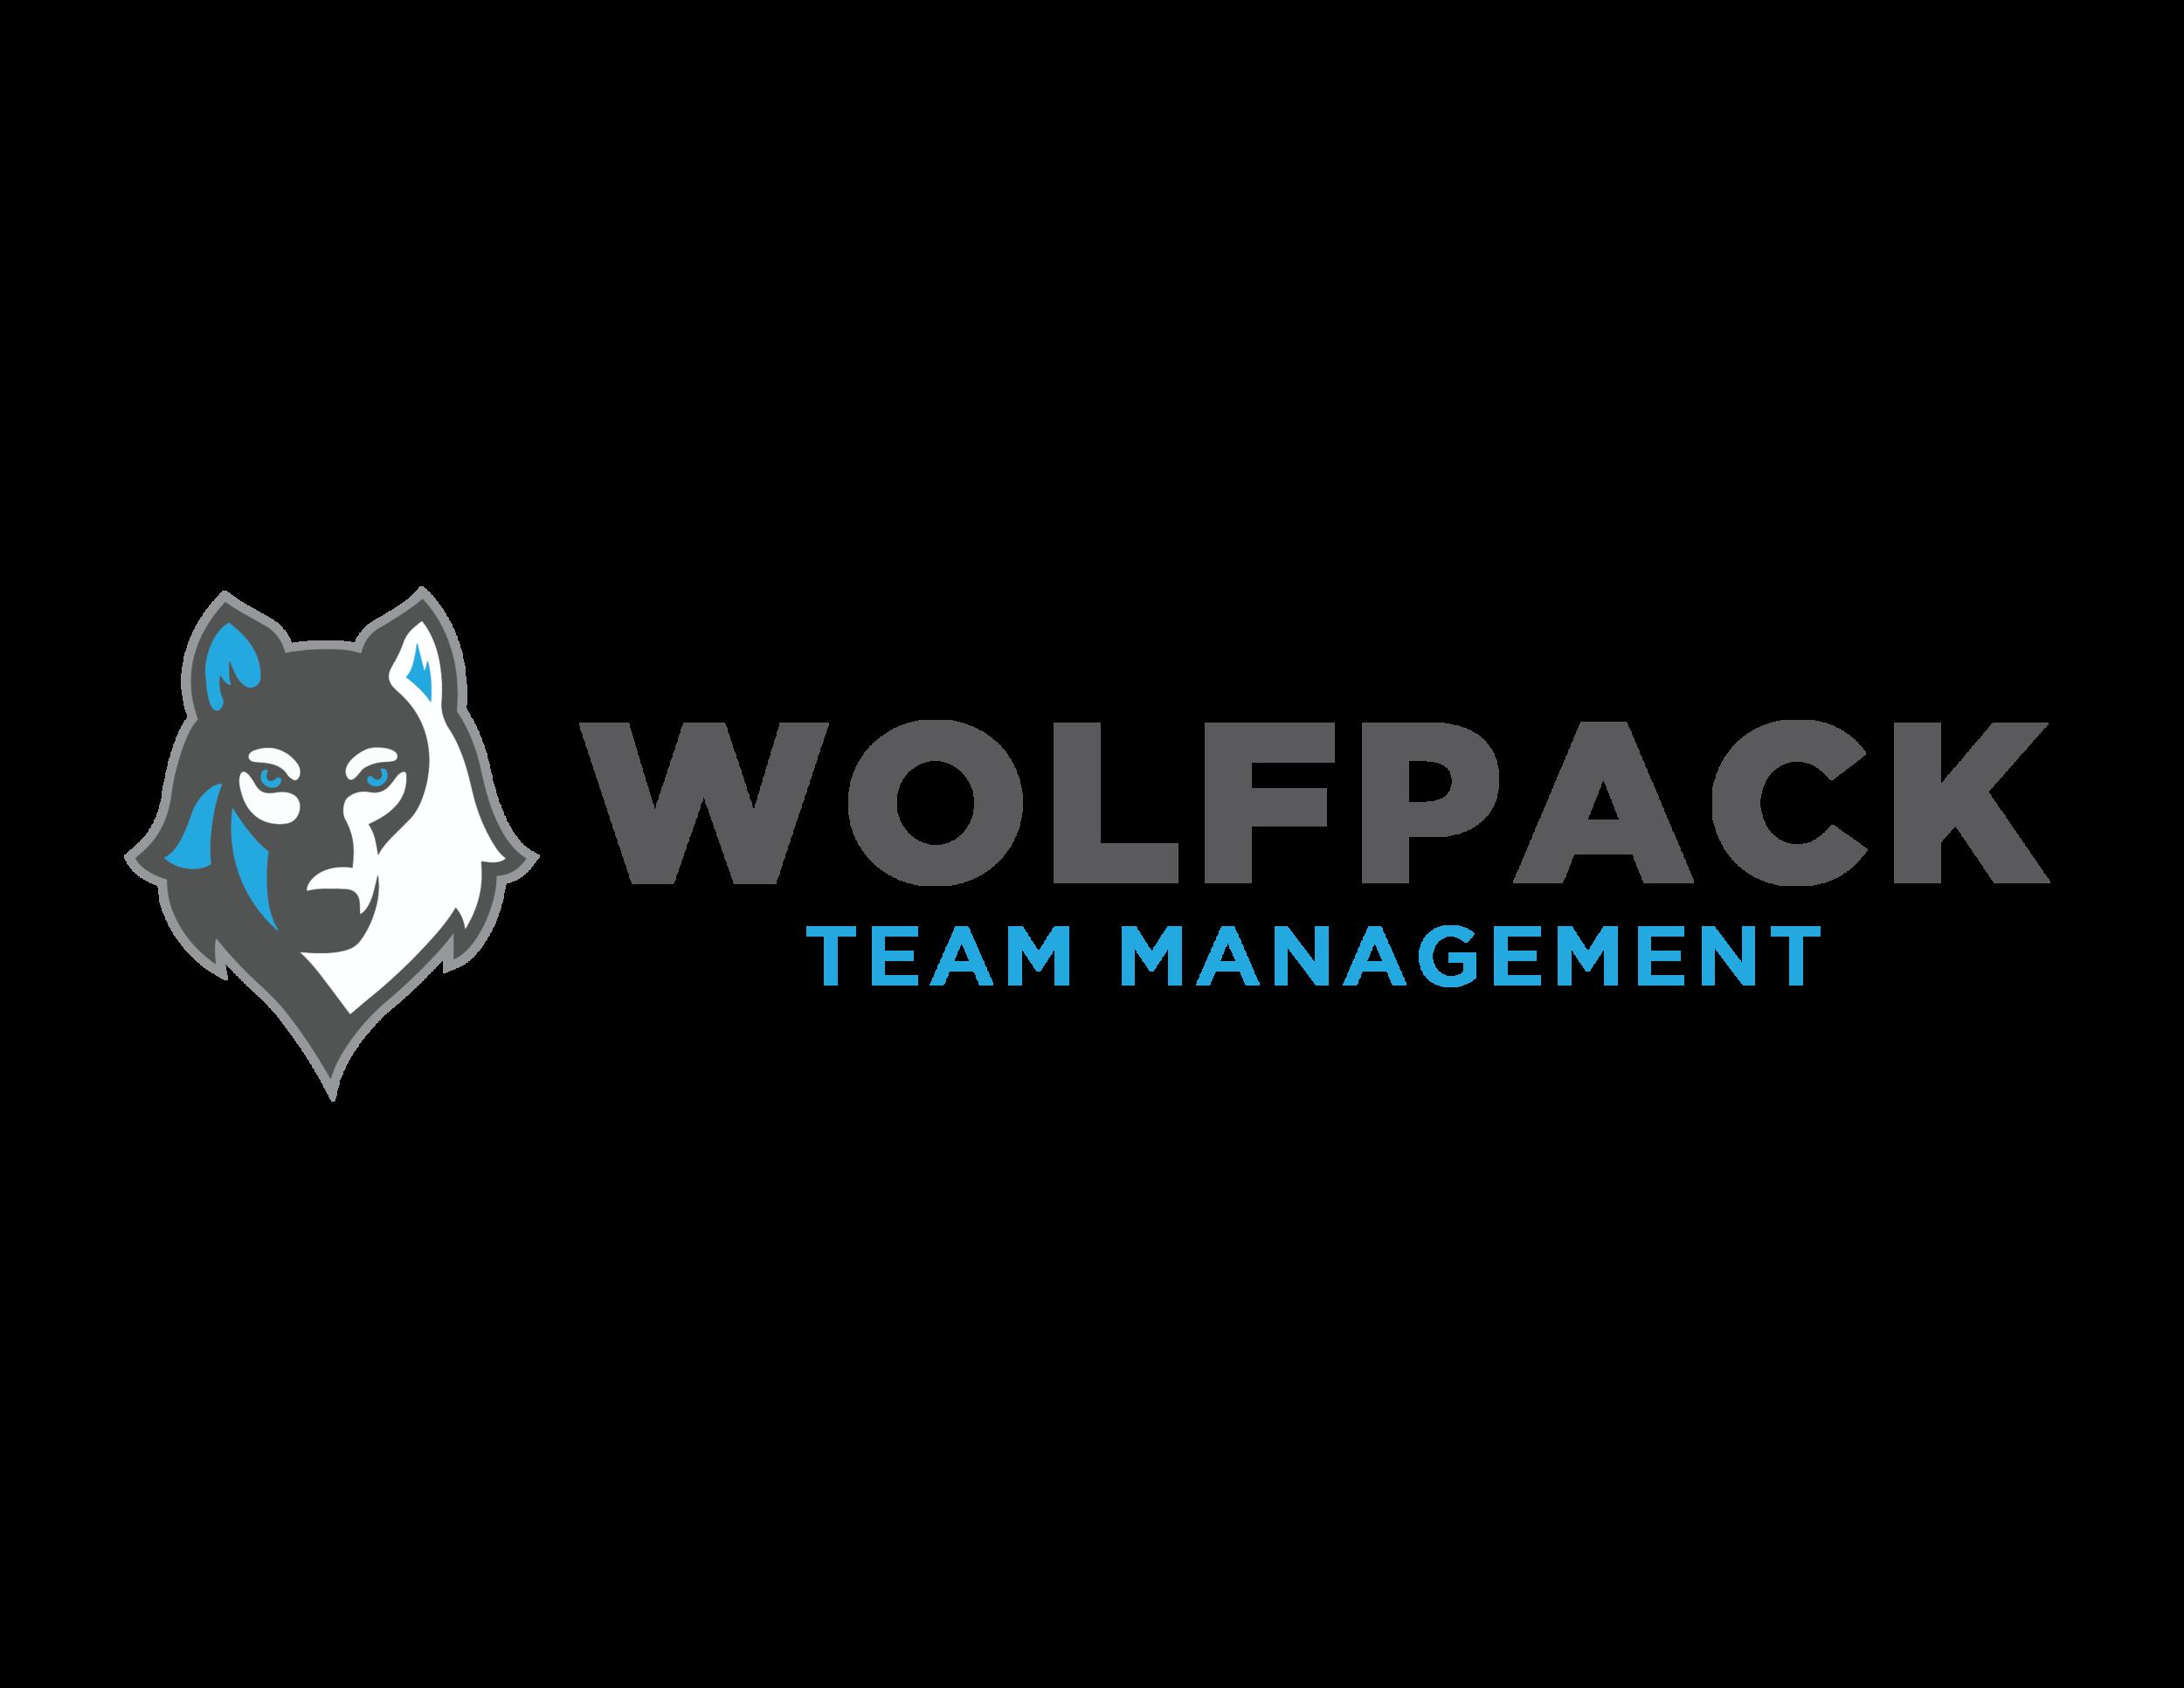 WolfpackTeamLOGO-02.png